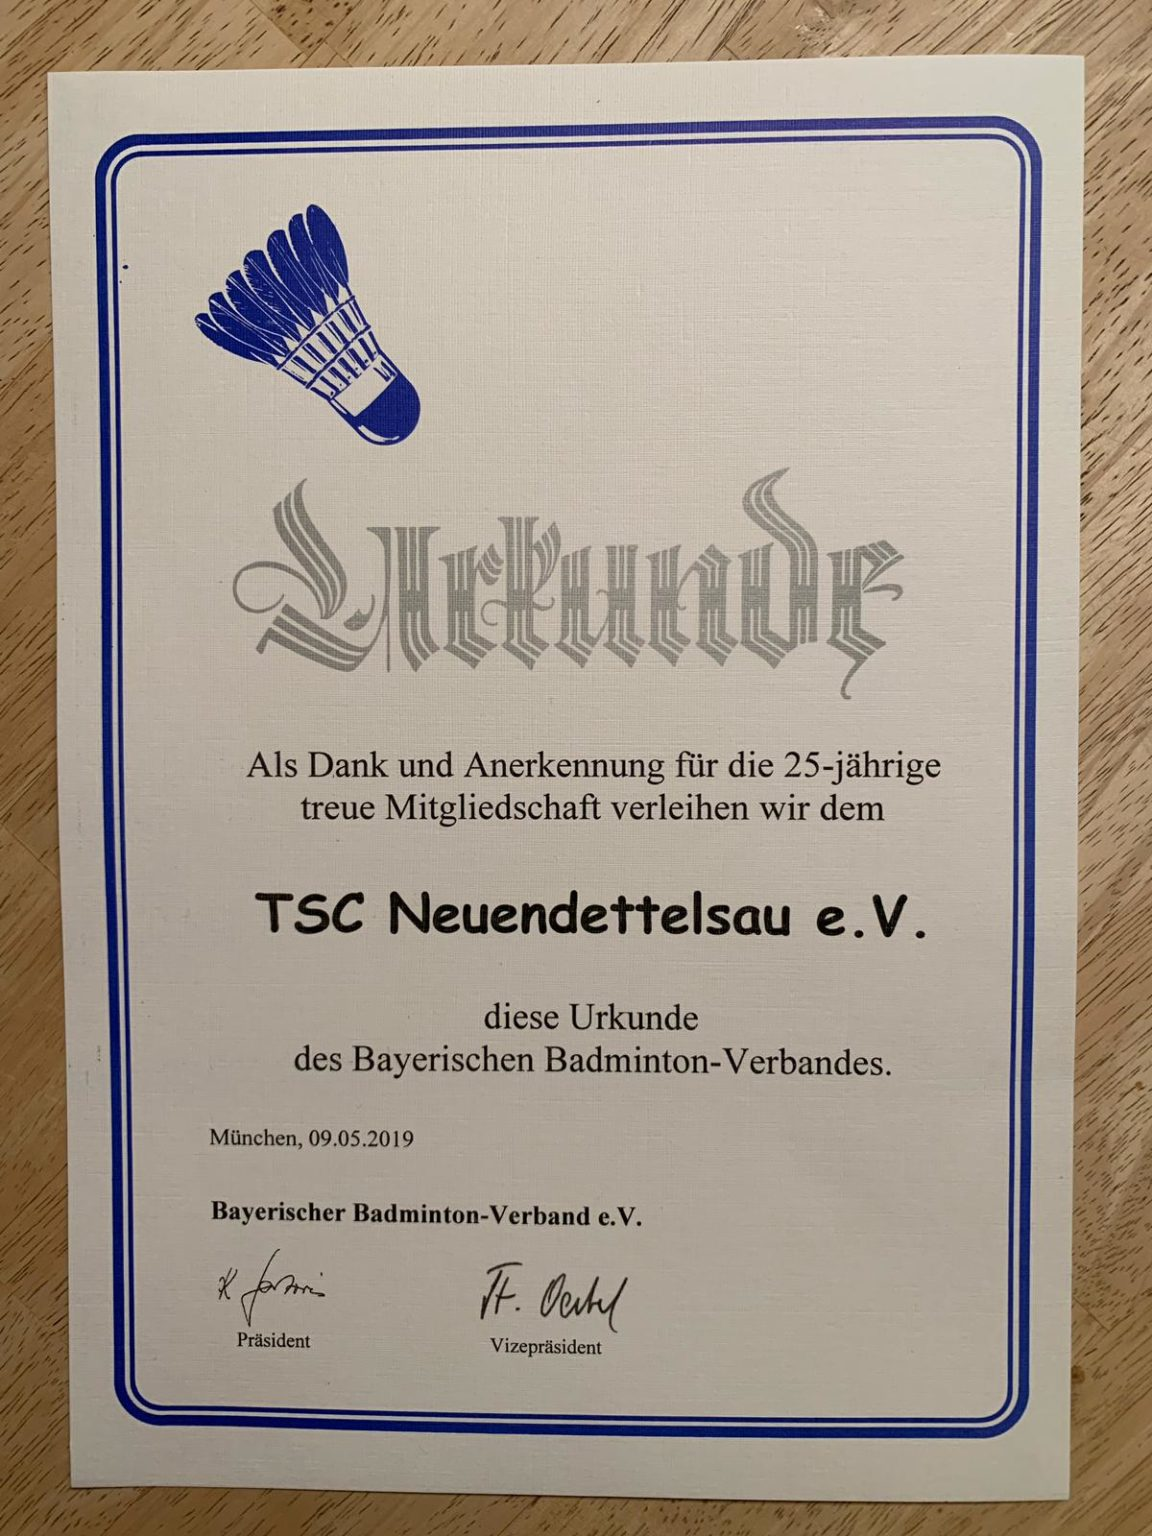 Tsc Neuendettelsau